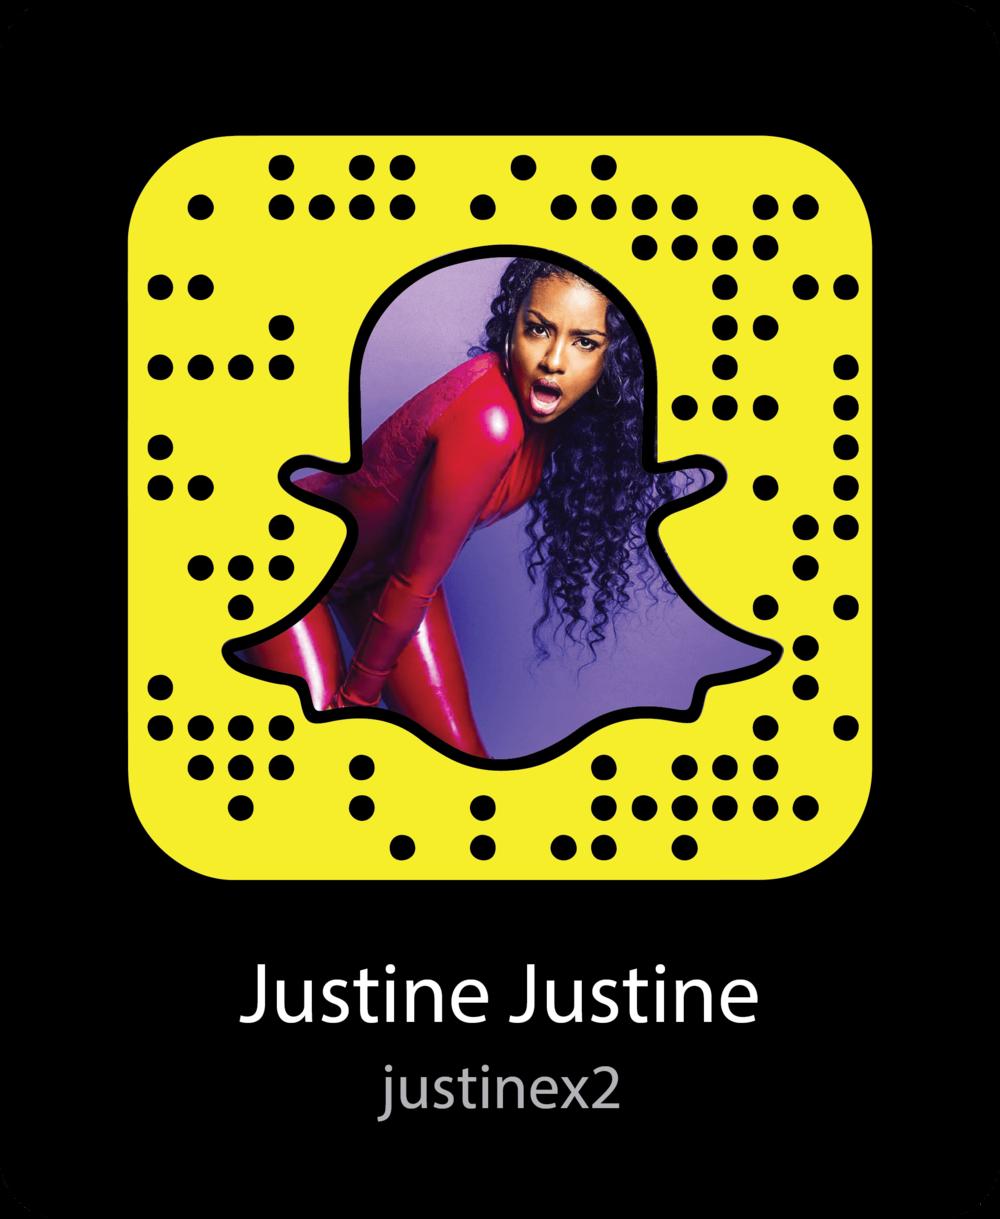 justine-justine-fitness-snapchat-snapcode